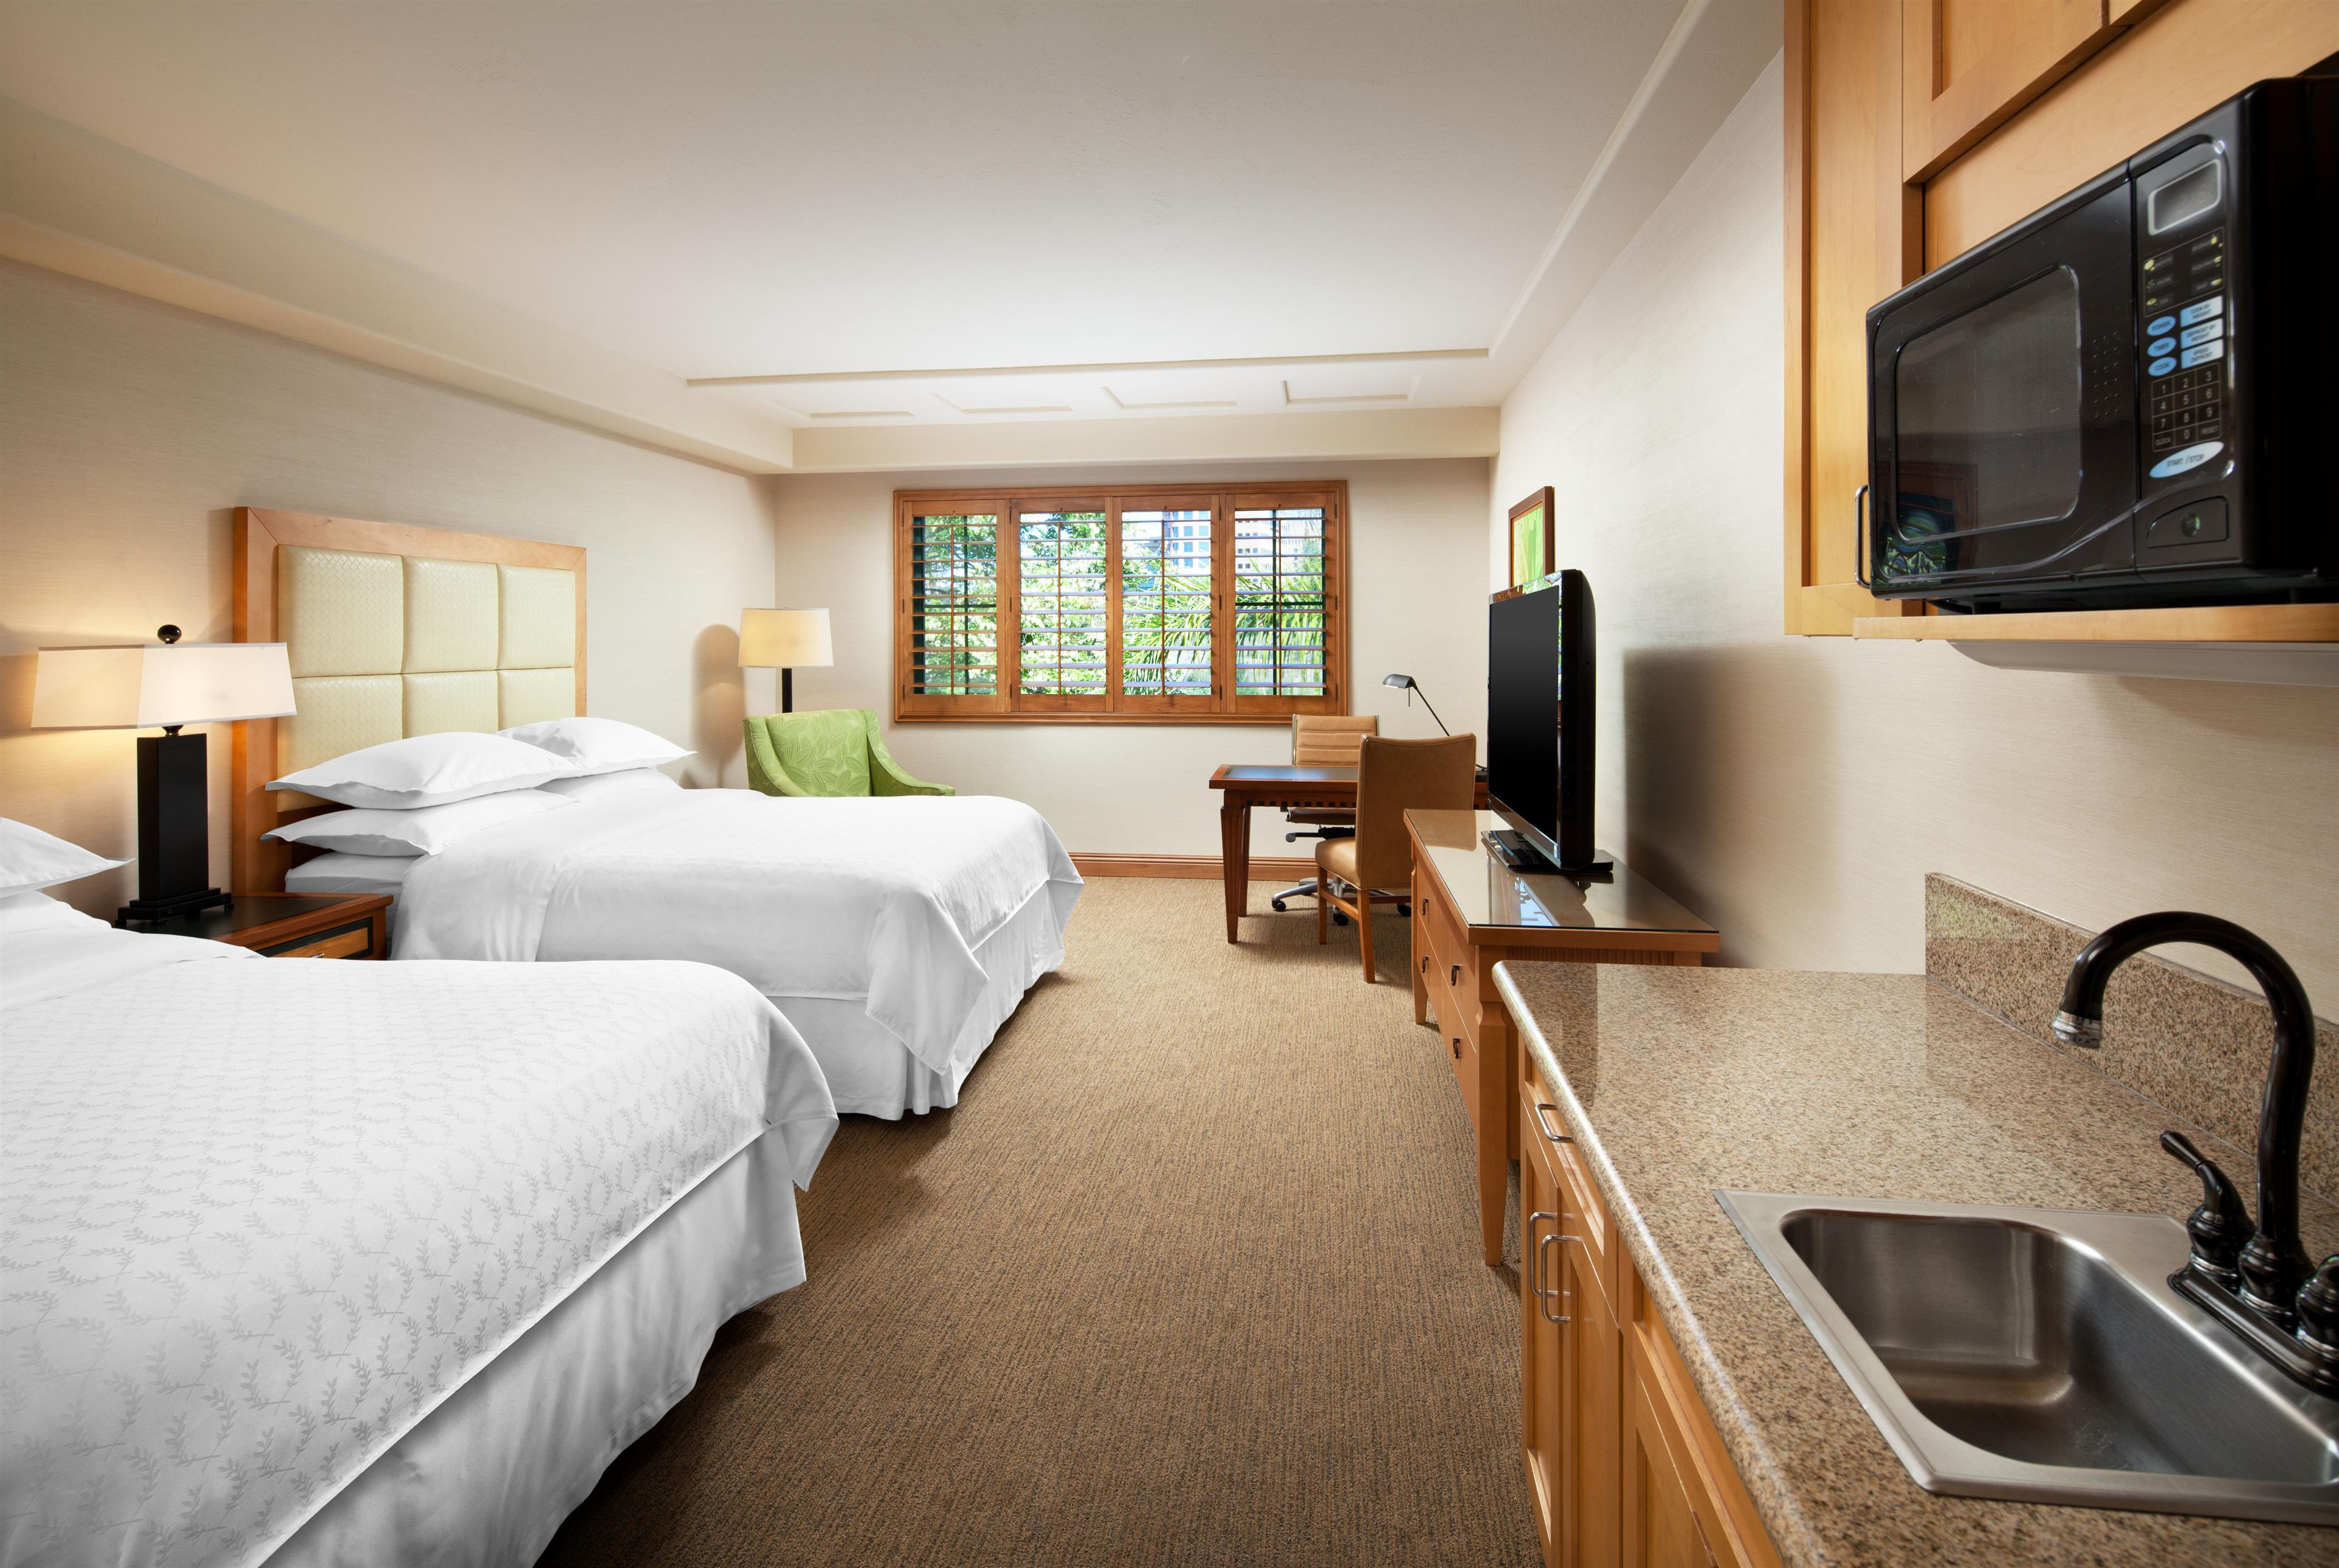 Sheraton La Jolla Hotel image 4